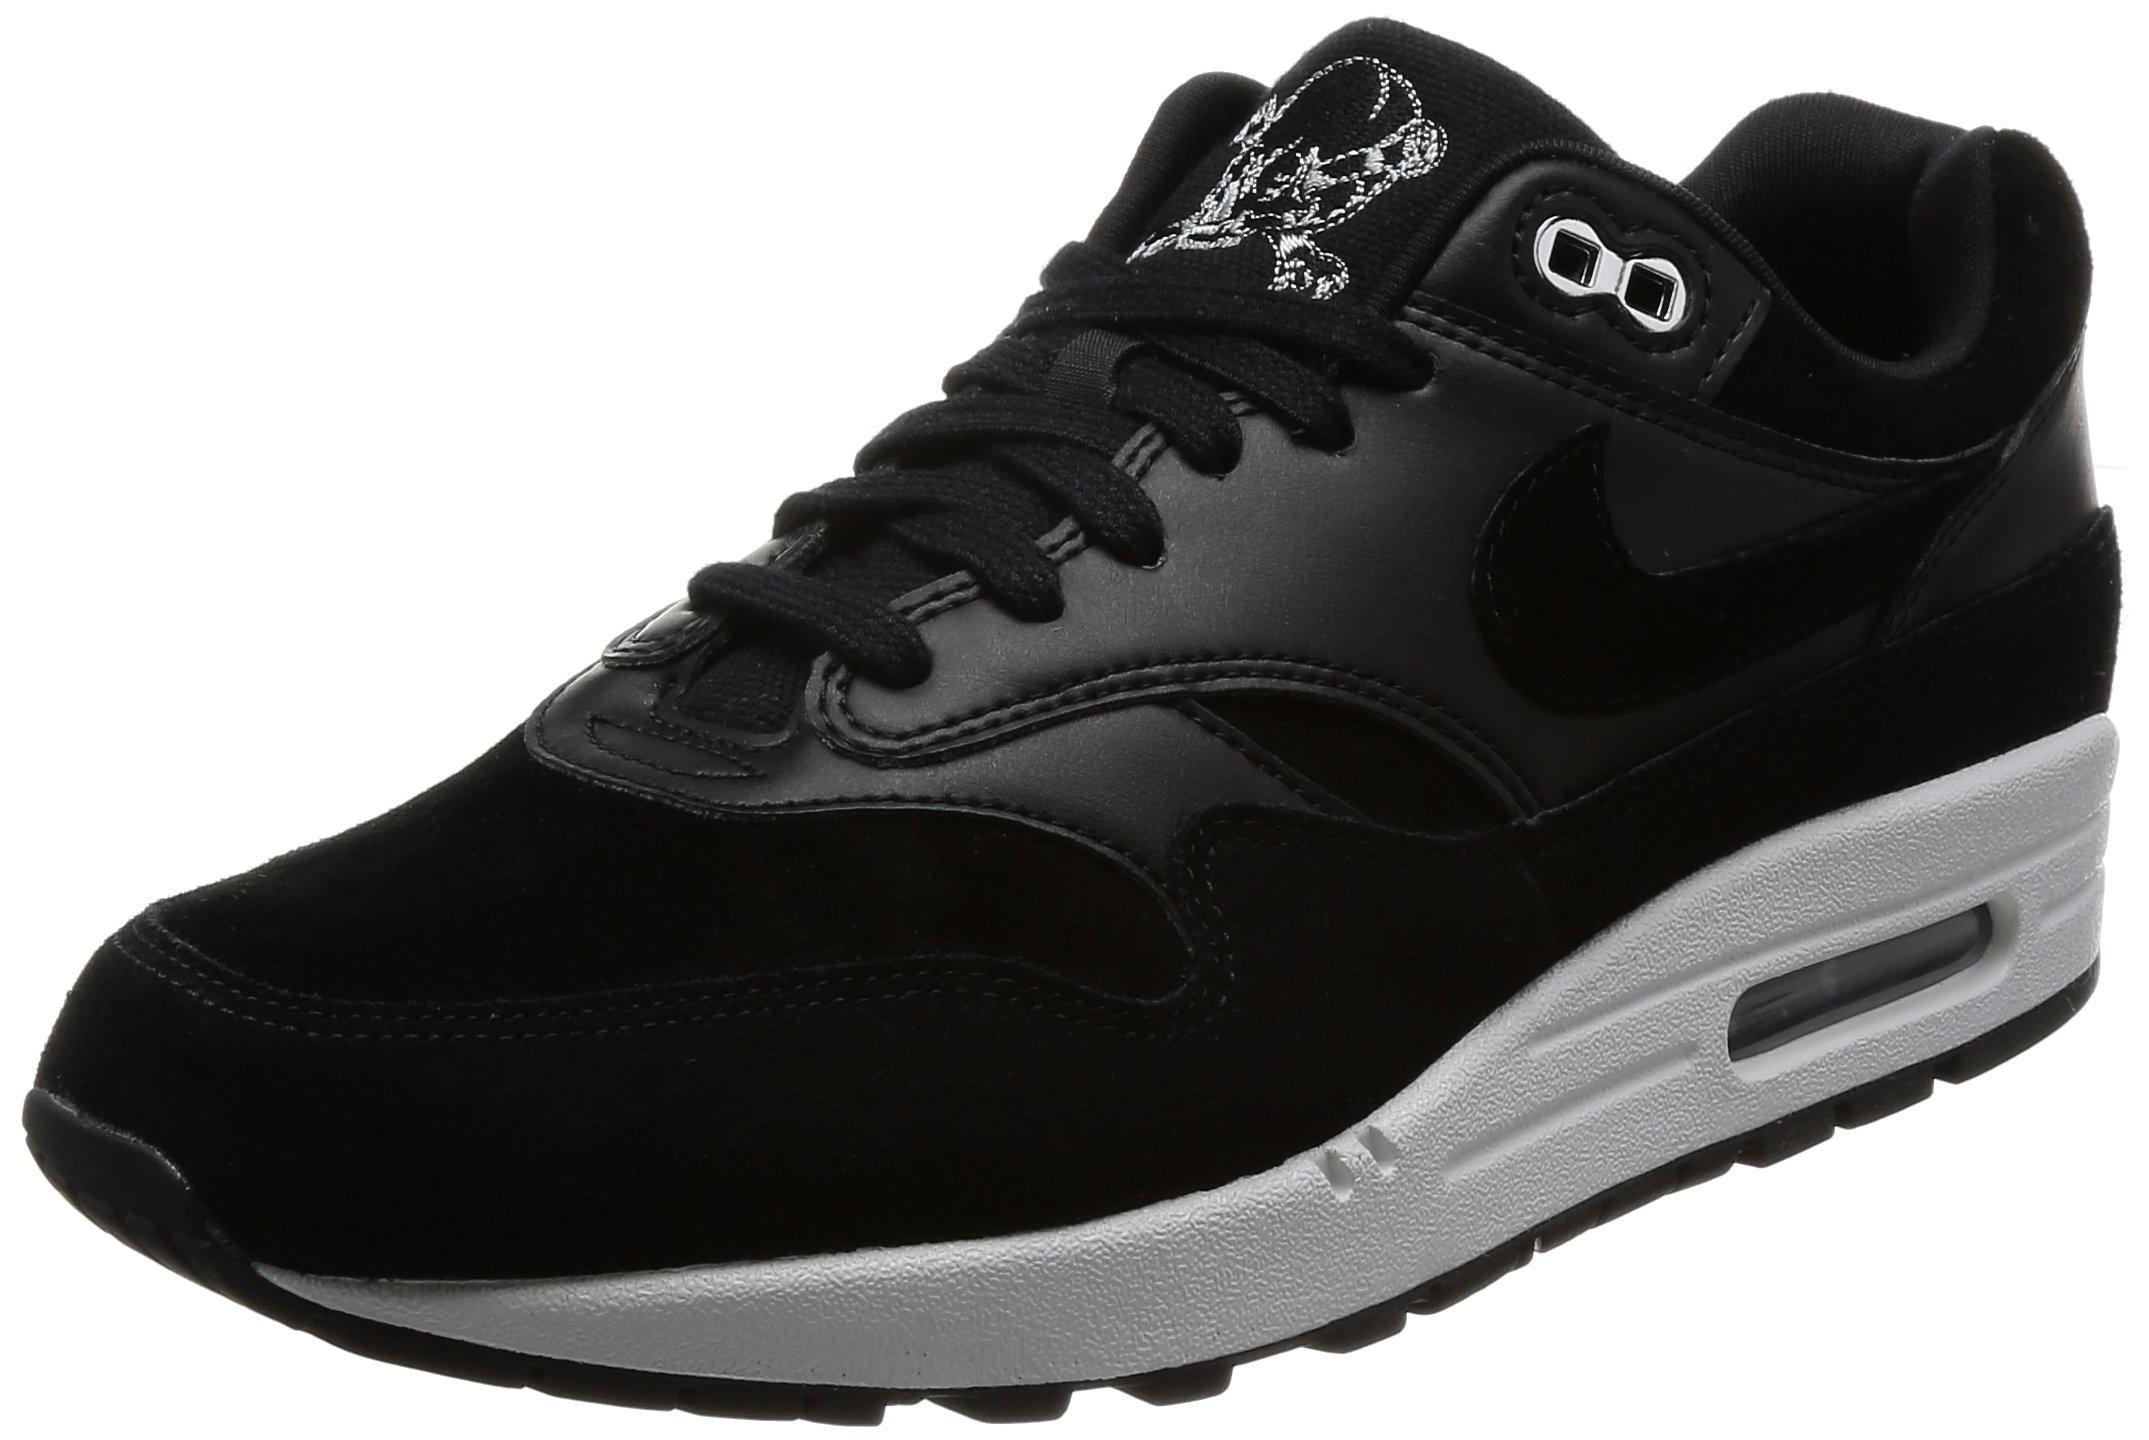 best wholesaler meet large discount Galleon - Nike Mens Air Max 1 Premium Skulls Black/Chrome ...